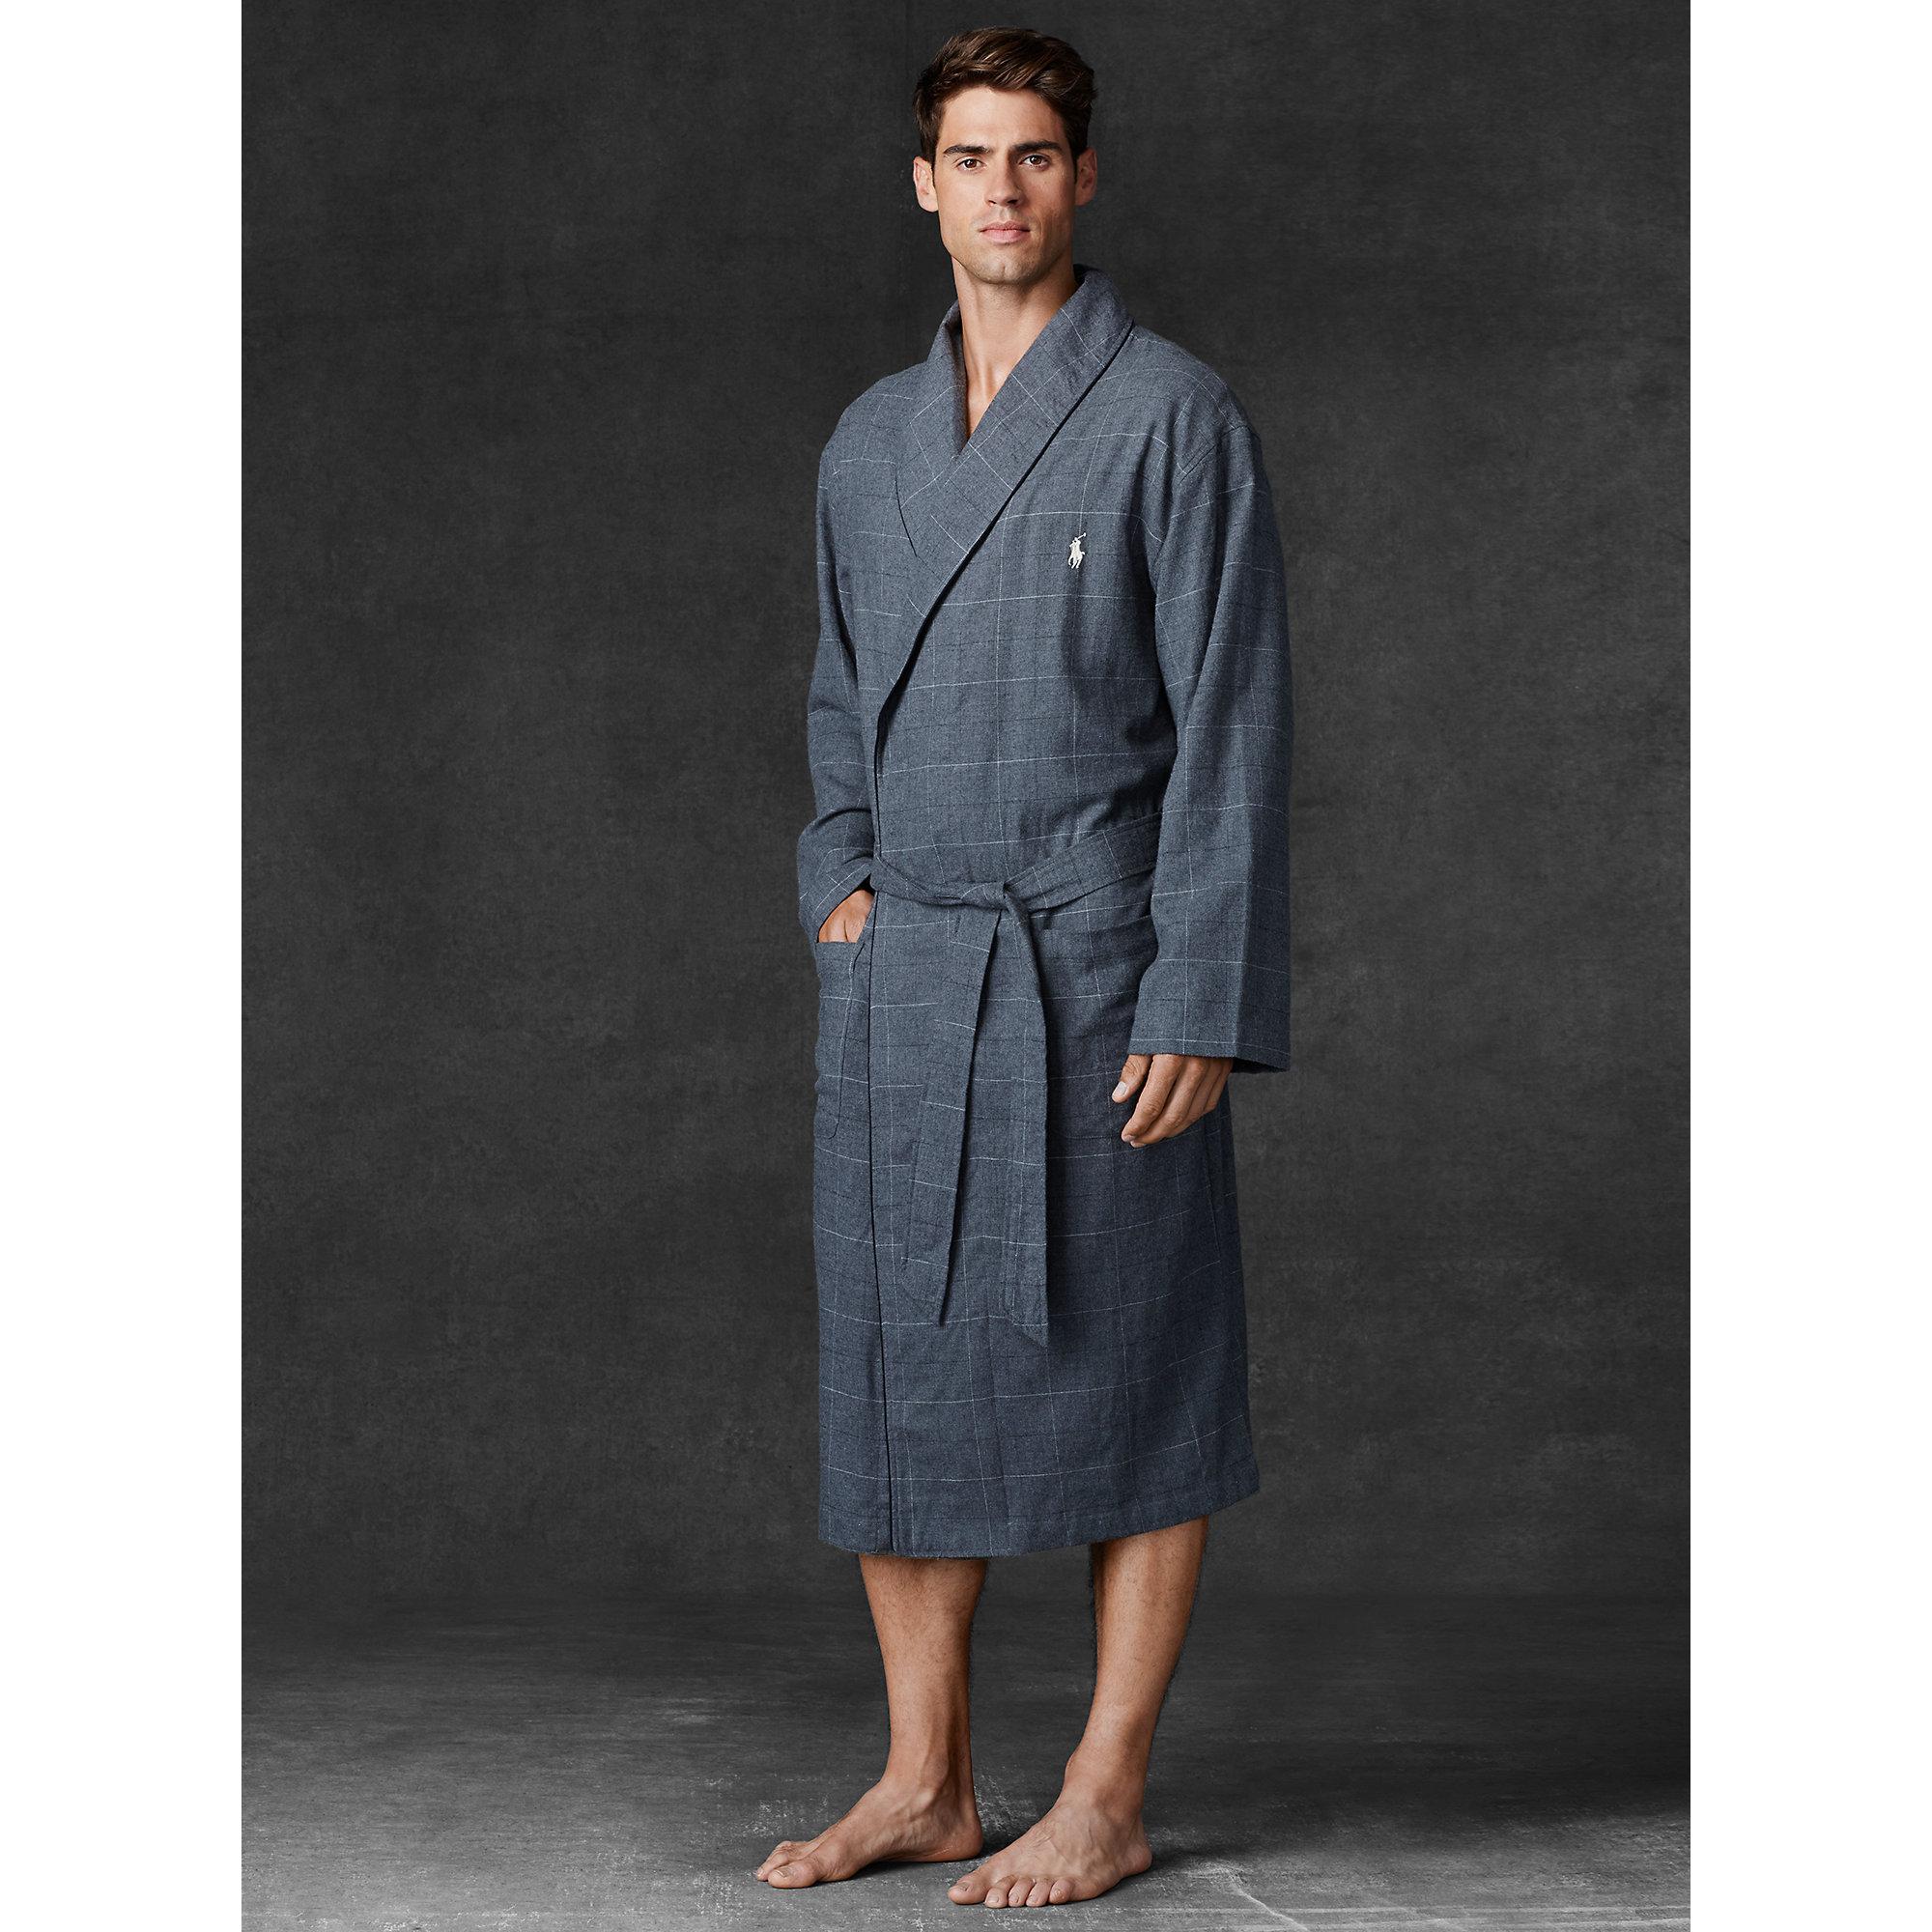 Lyst - Polo Ralph Lauren Flannel Shawl-Collar Robe in Gray for Men